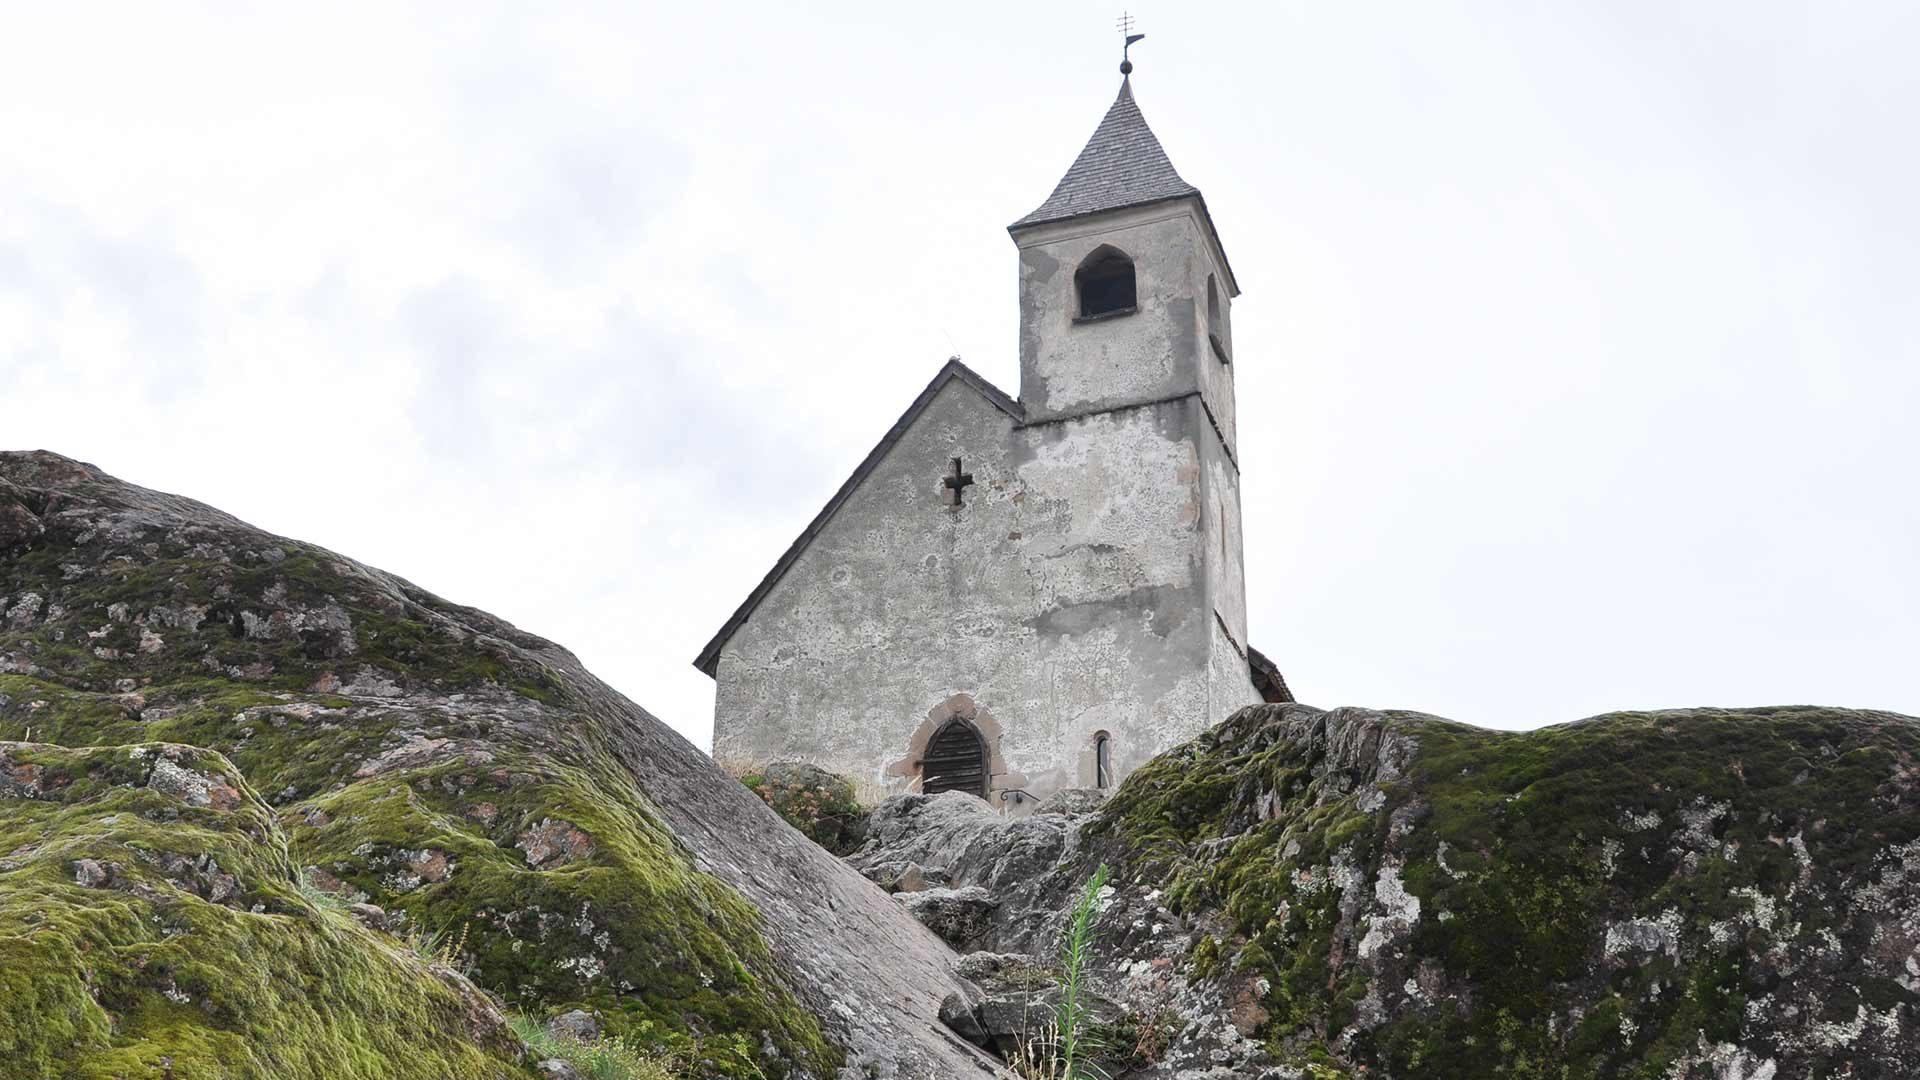 St. Hippolyt Kirchlein oberhalb von St. Leonhard